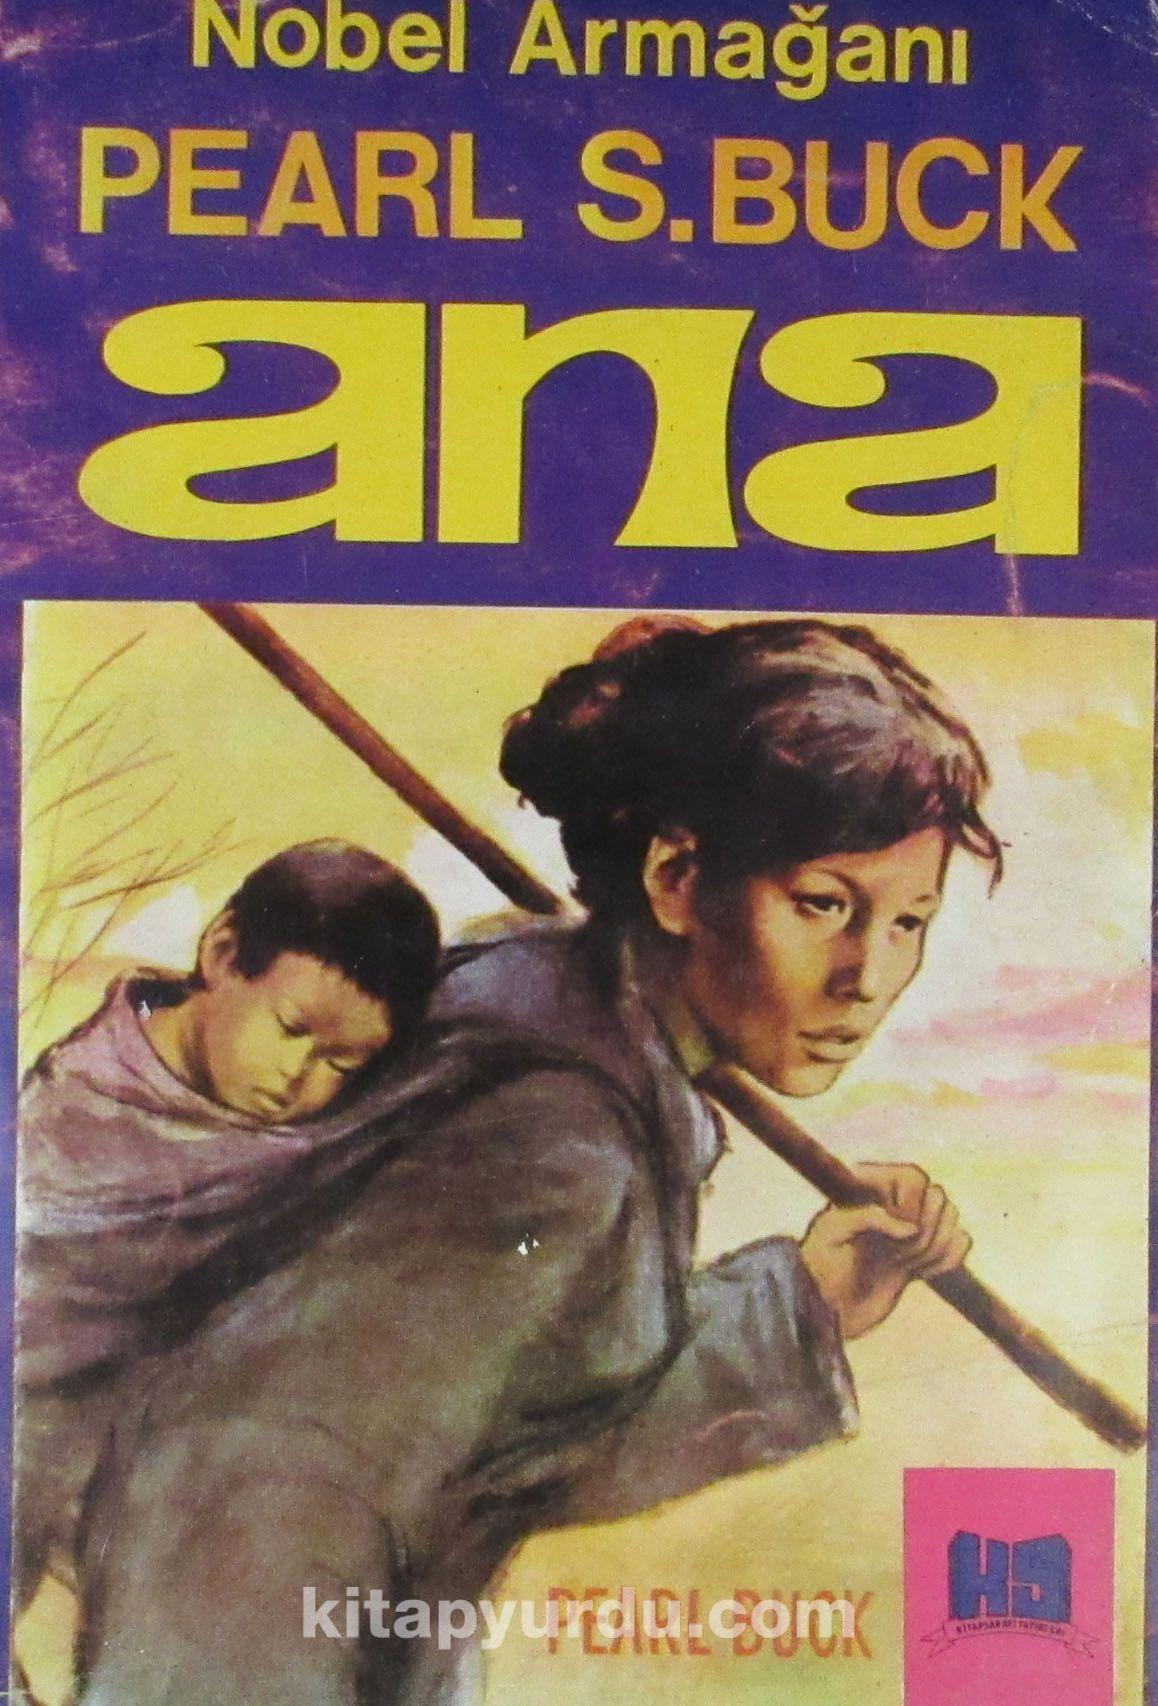 Ana(1-B-41)